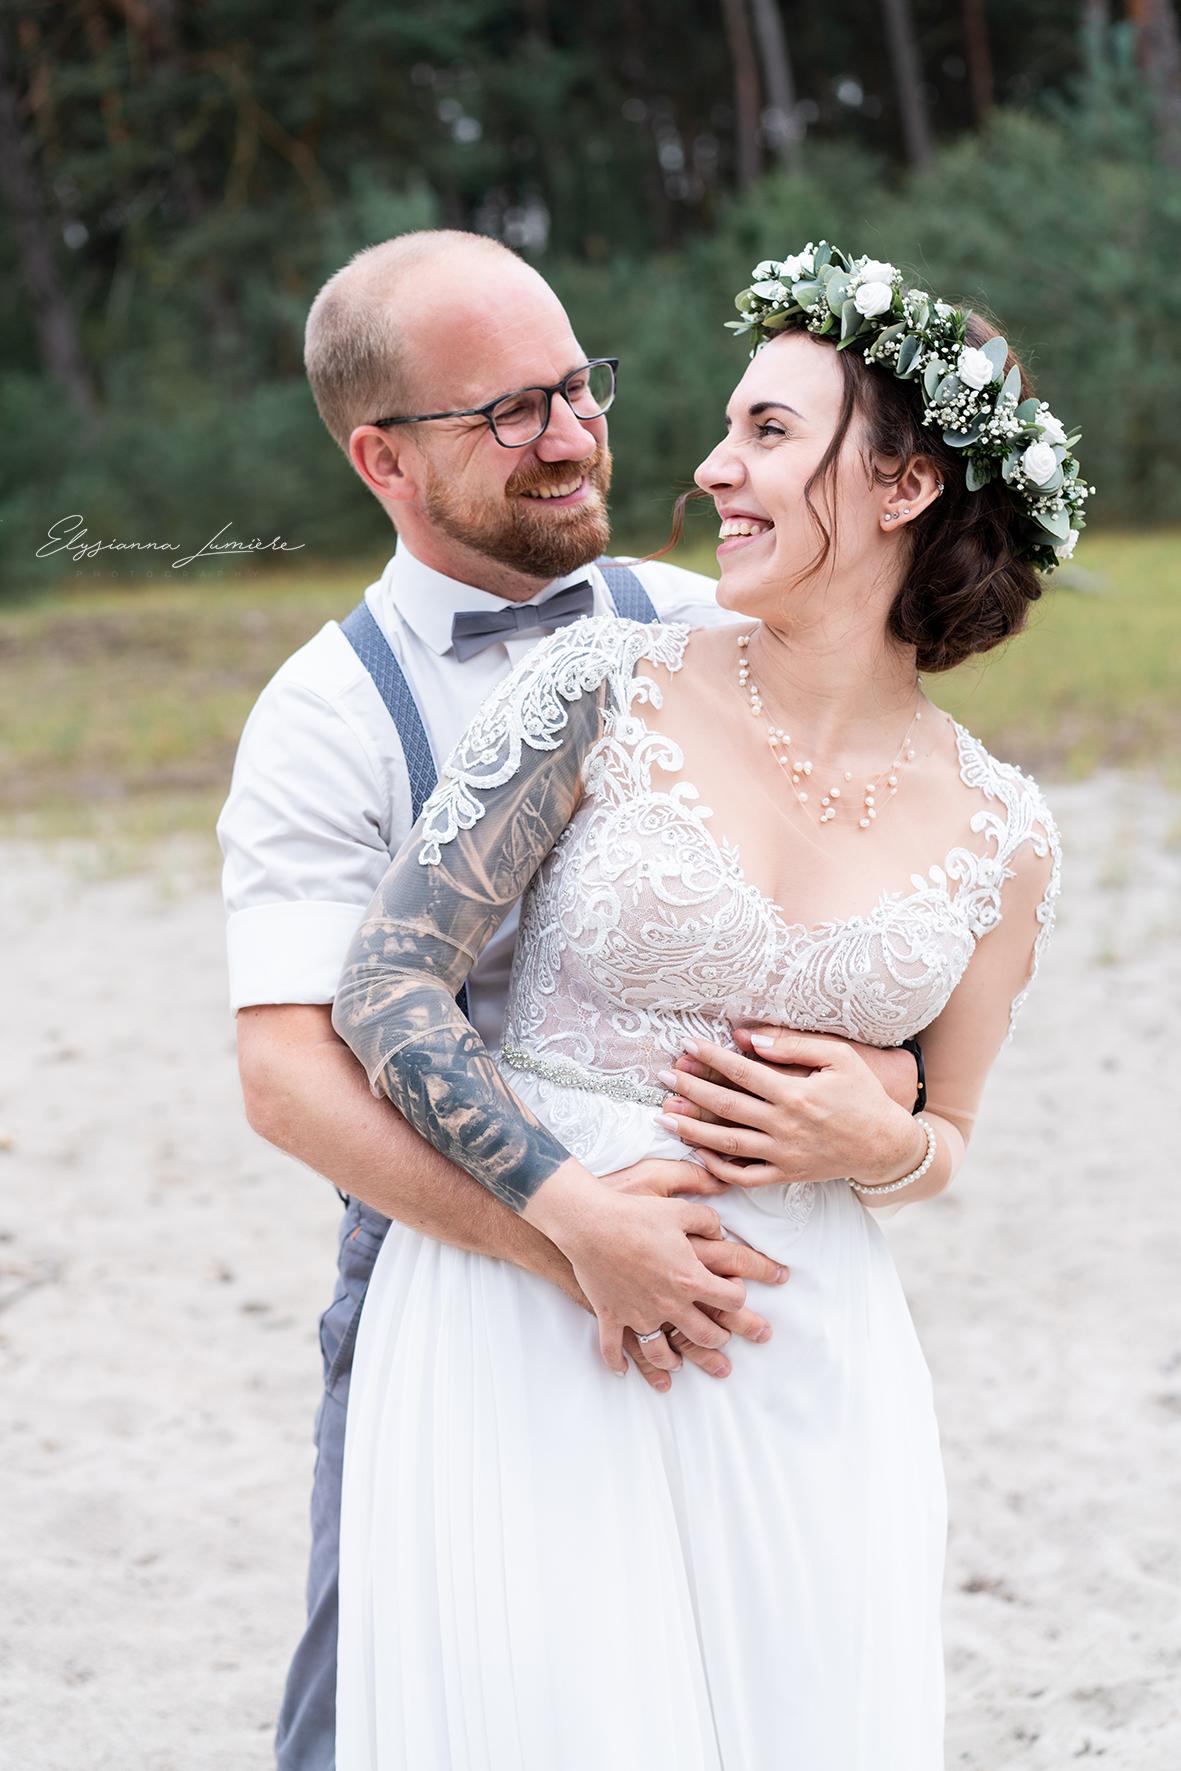 Lachendes Brautpaar bei den Hochzeitsfotos Weddingshooting in den Dünen